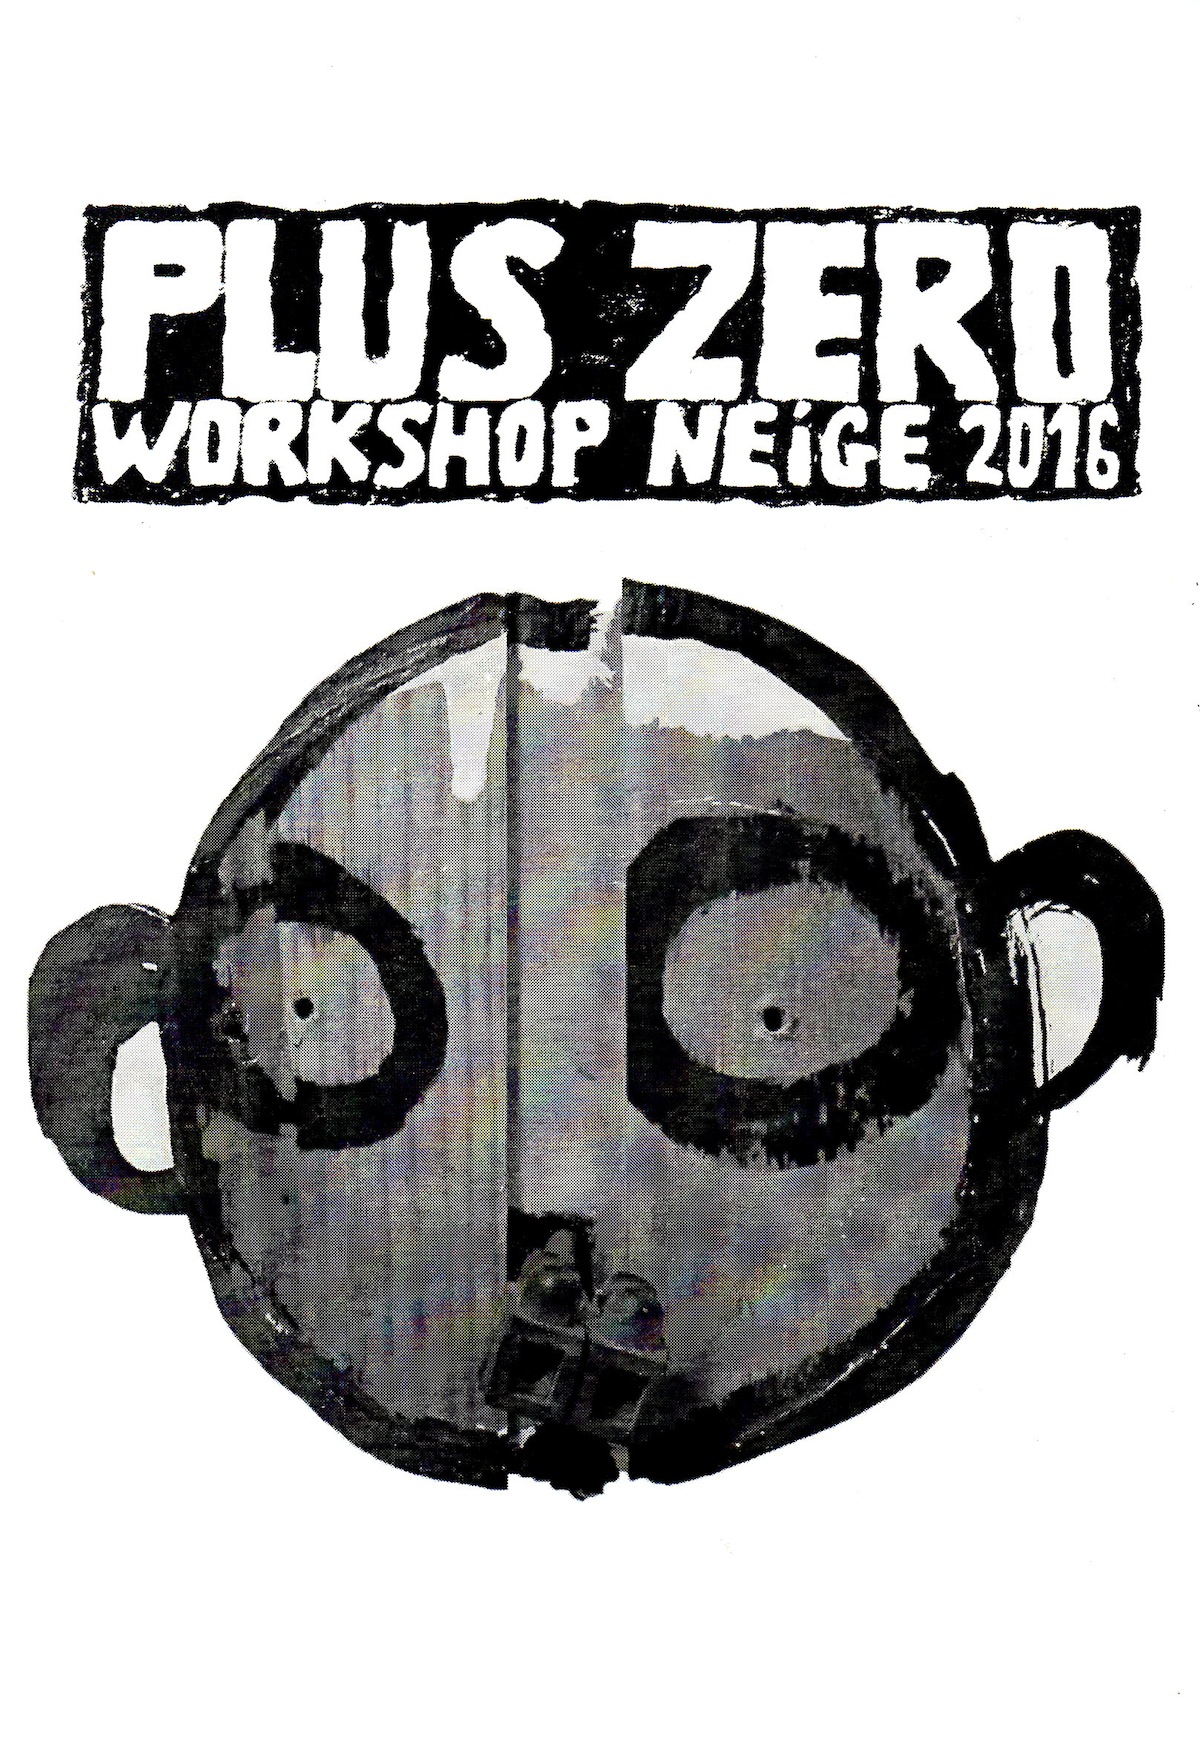 Fanzine Workshop neige©2016